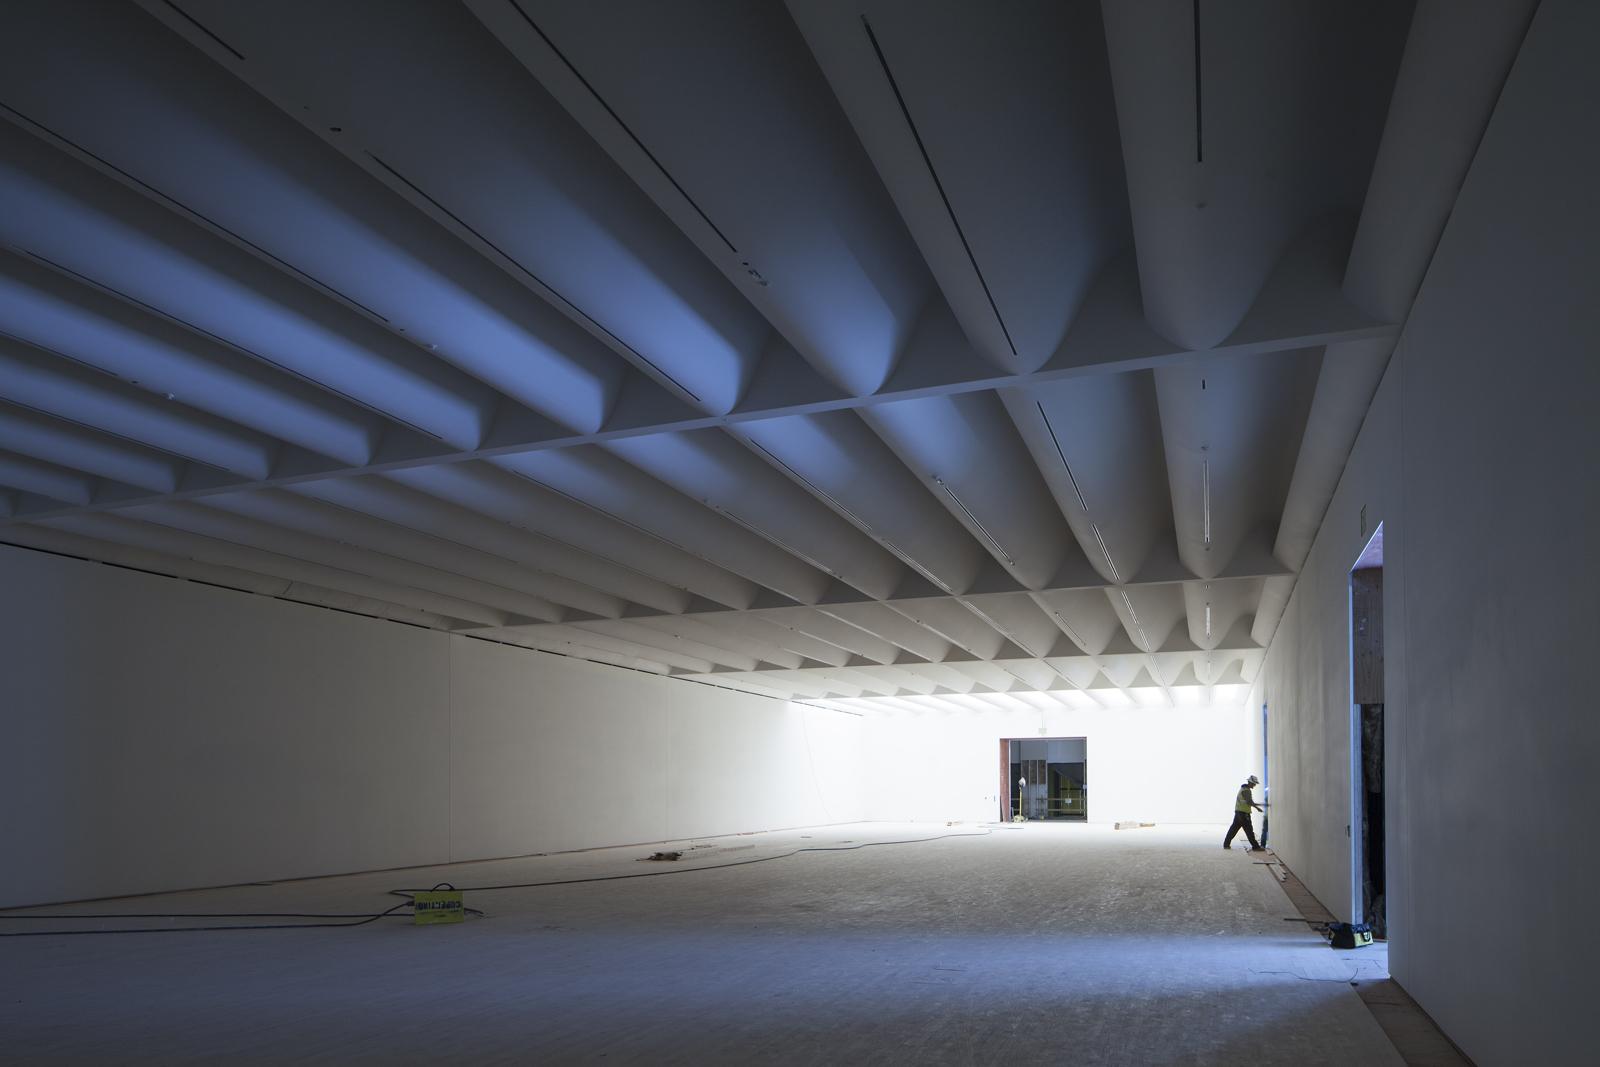 SFMOMA 5th floor gallery